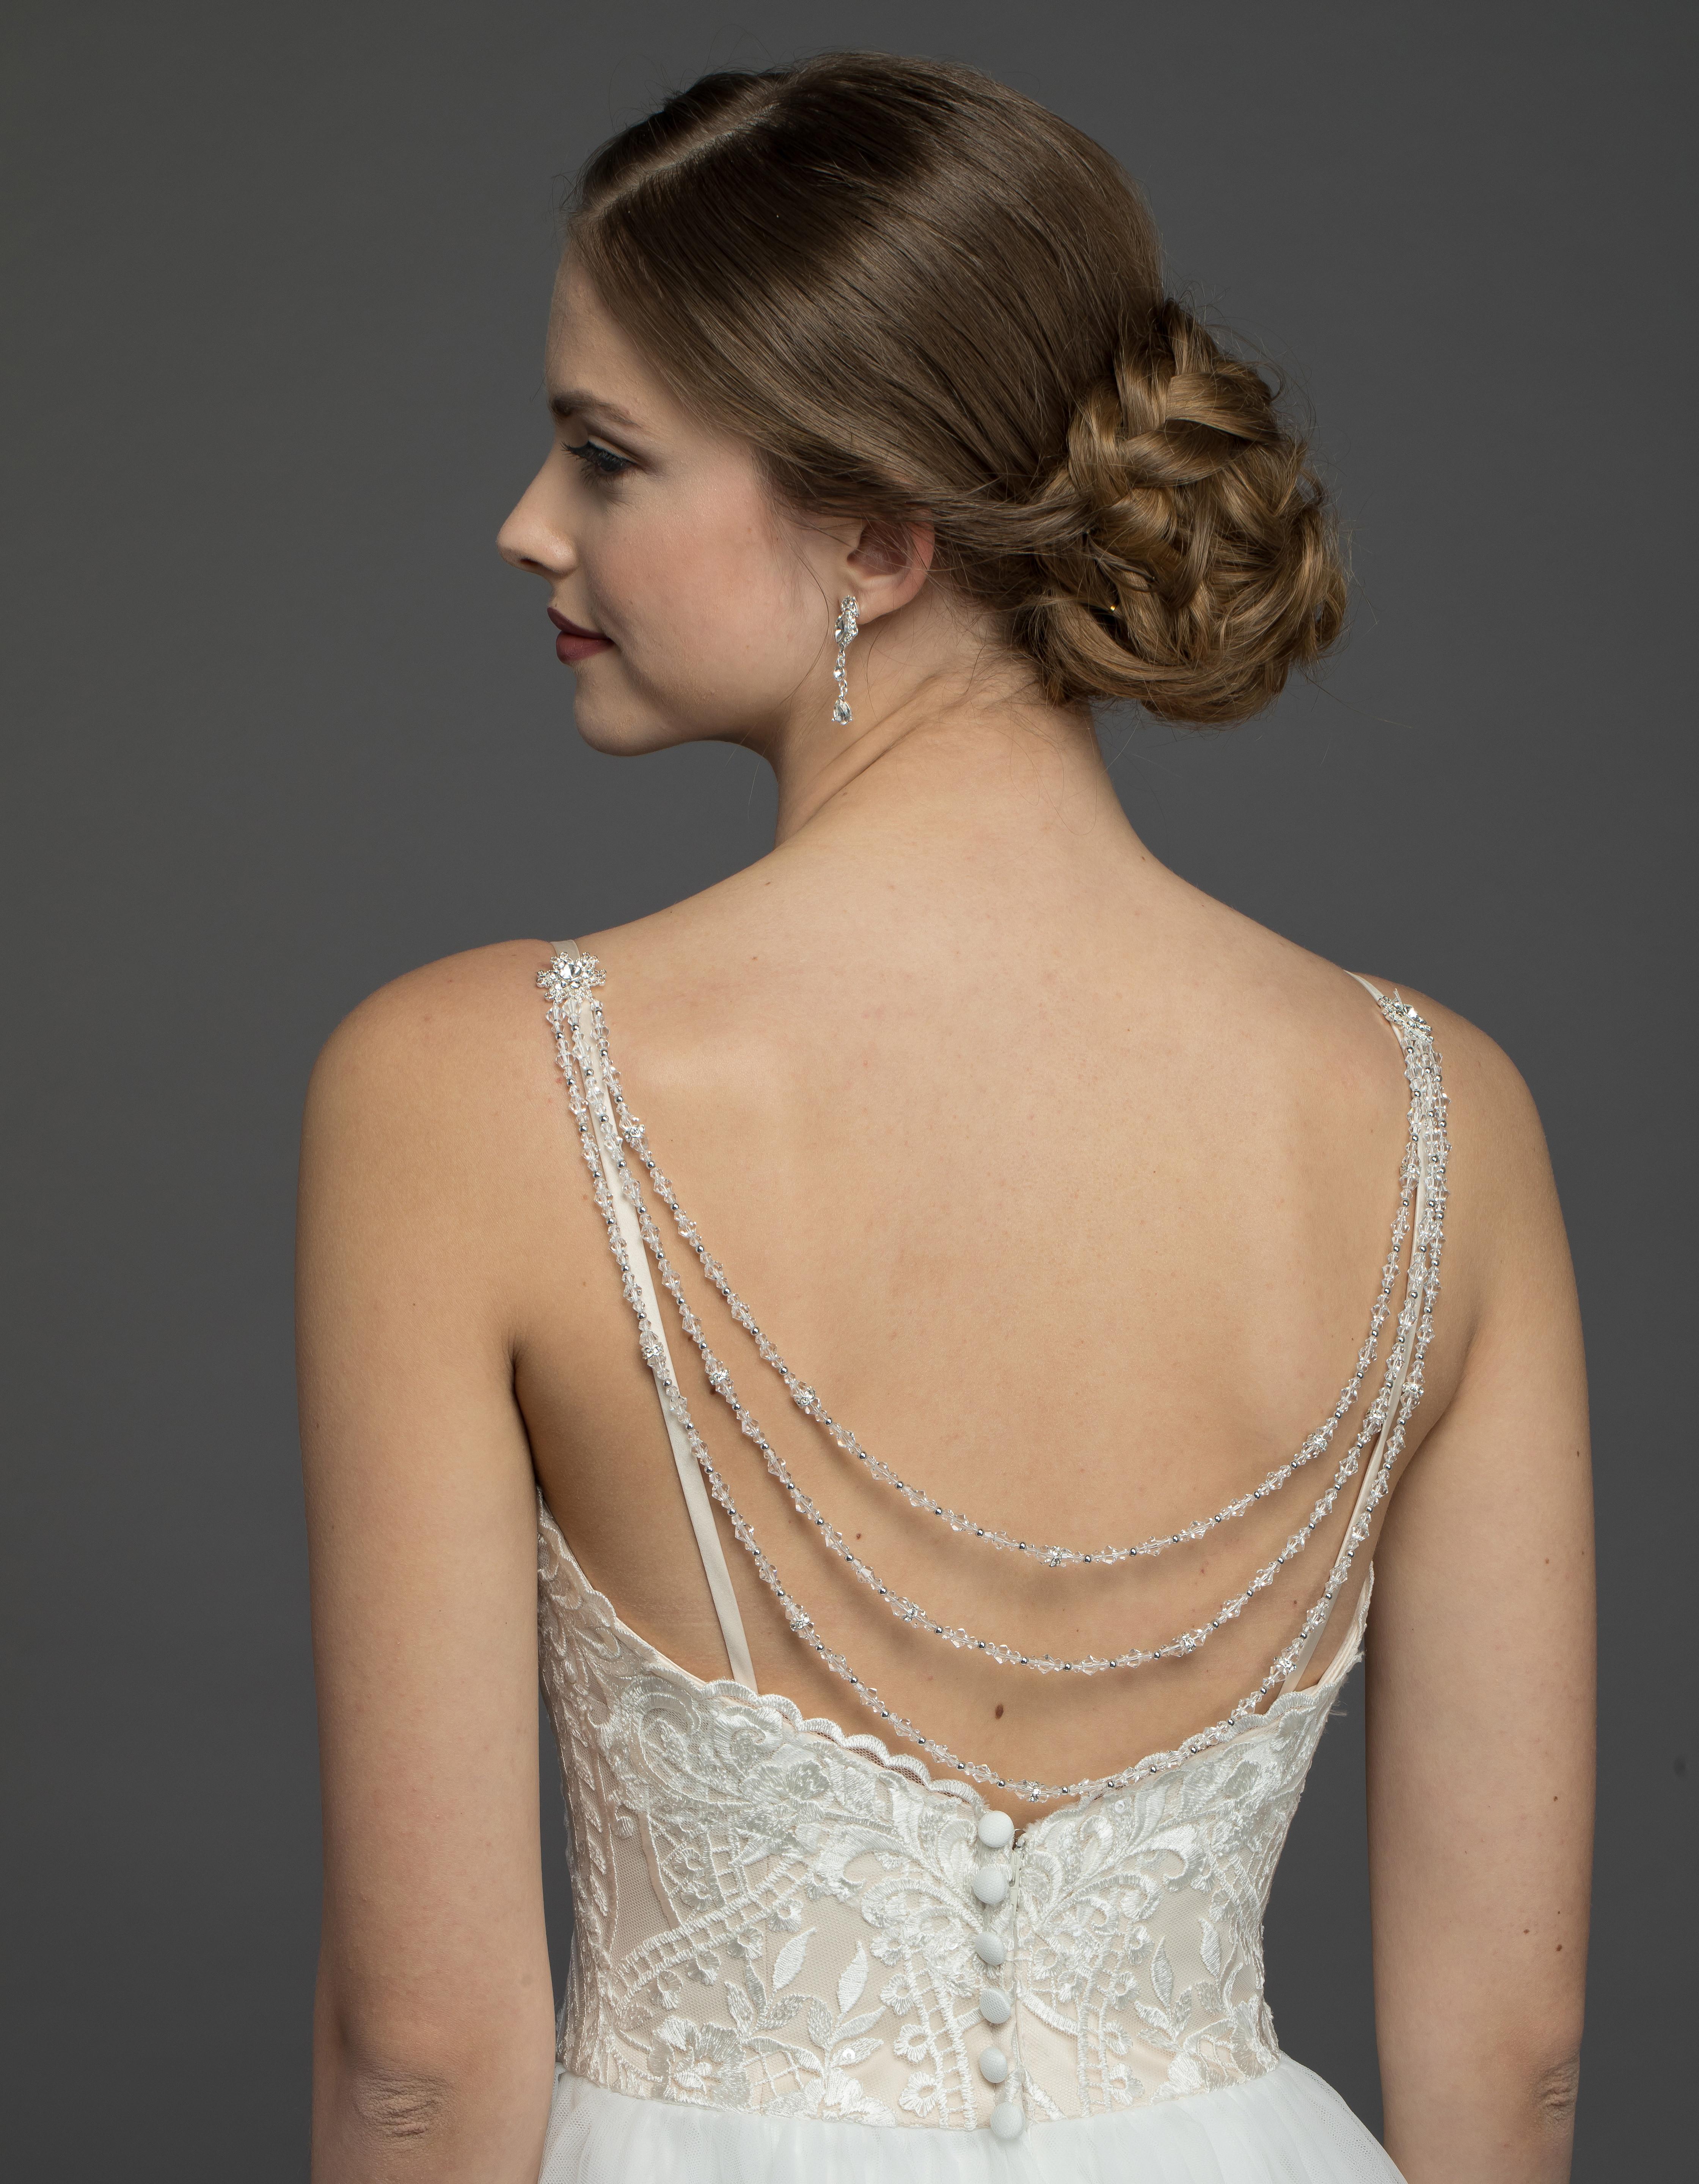 Bridal Classics Belts & Gown Jewellery BN-04